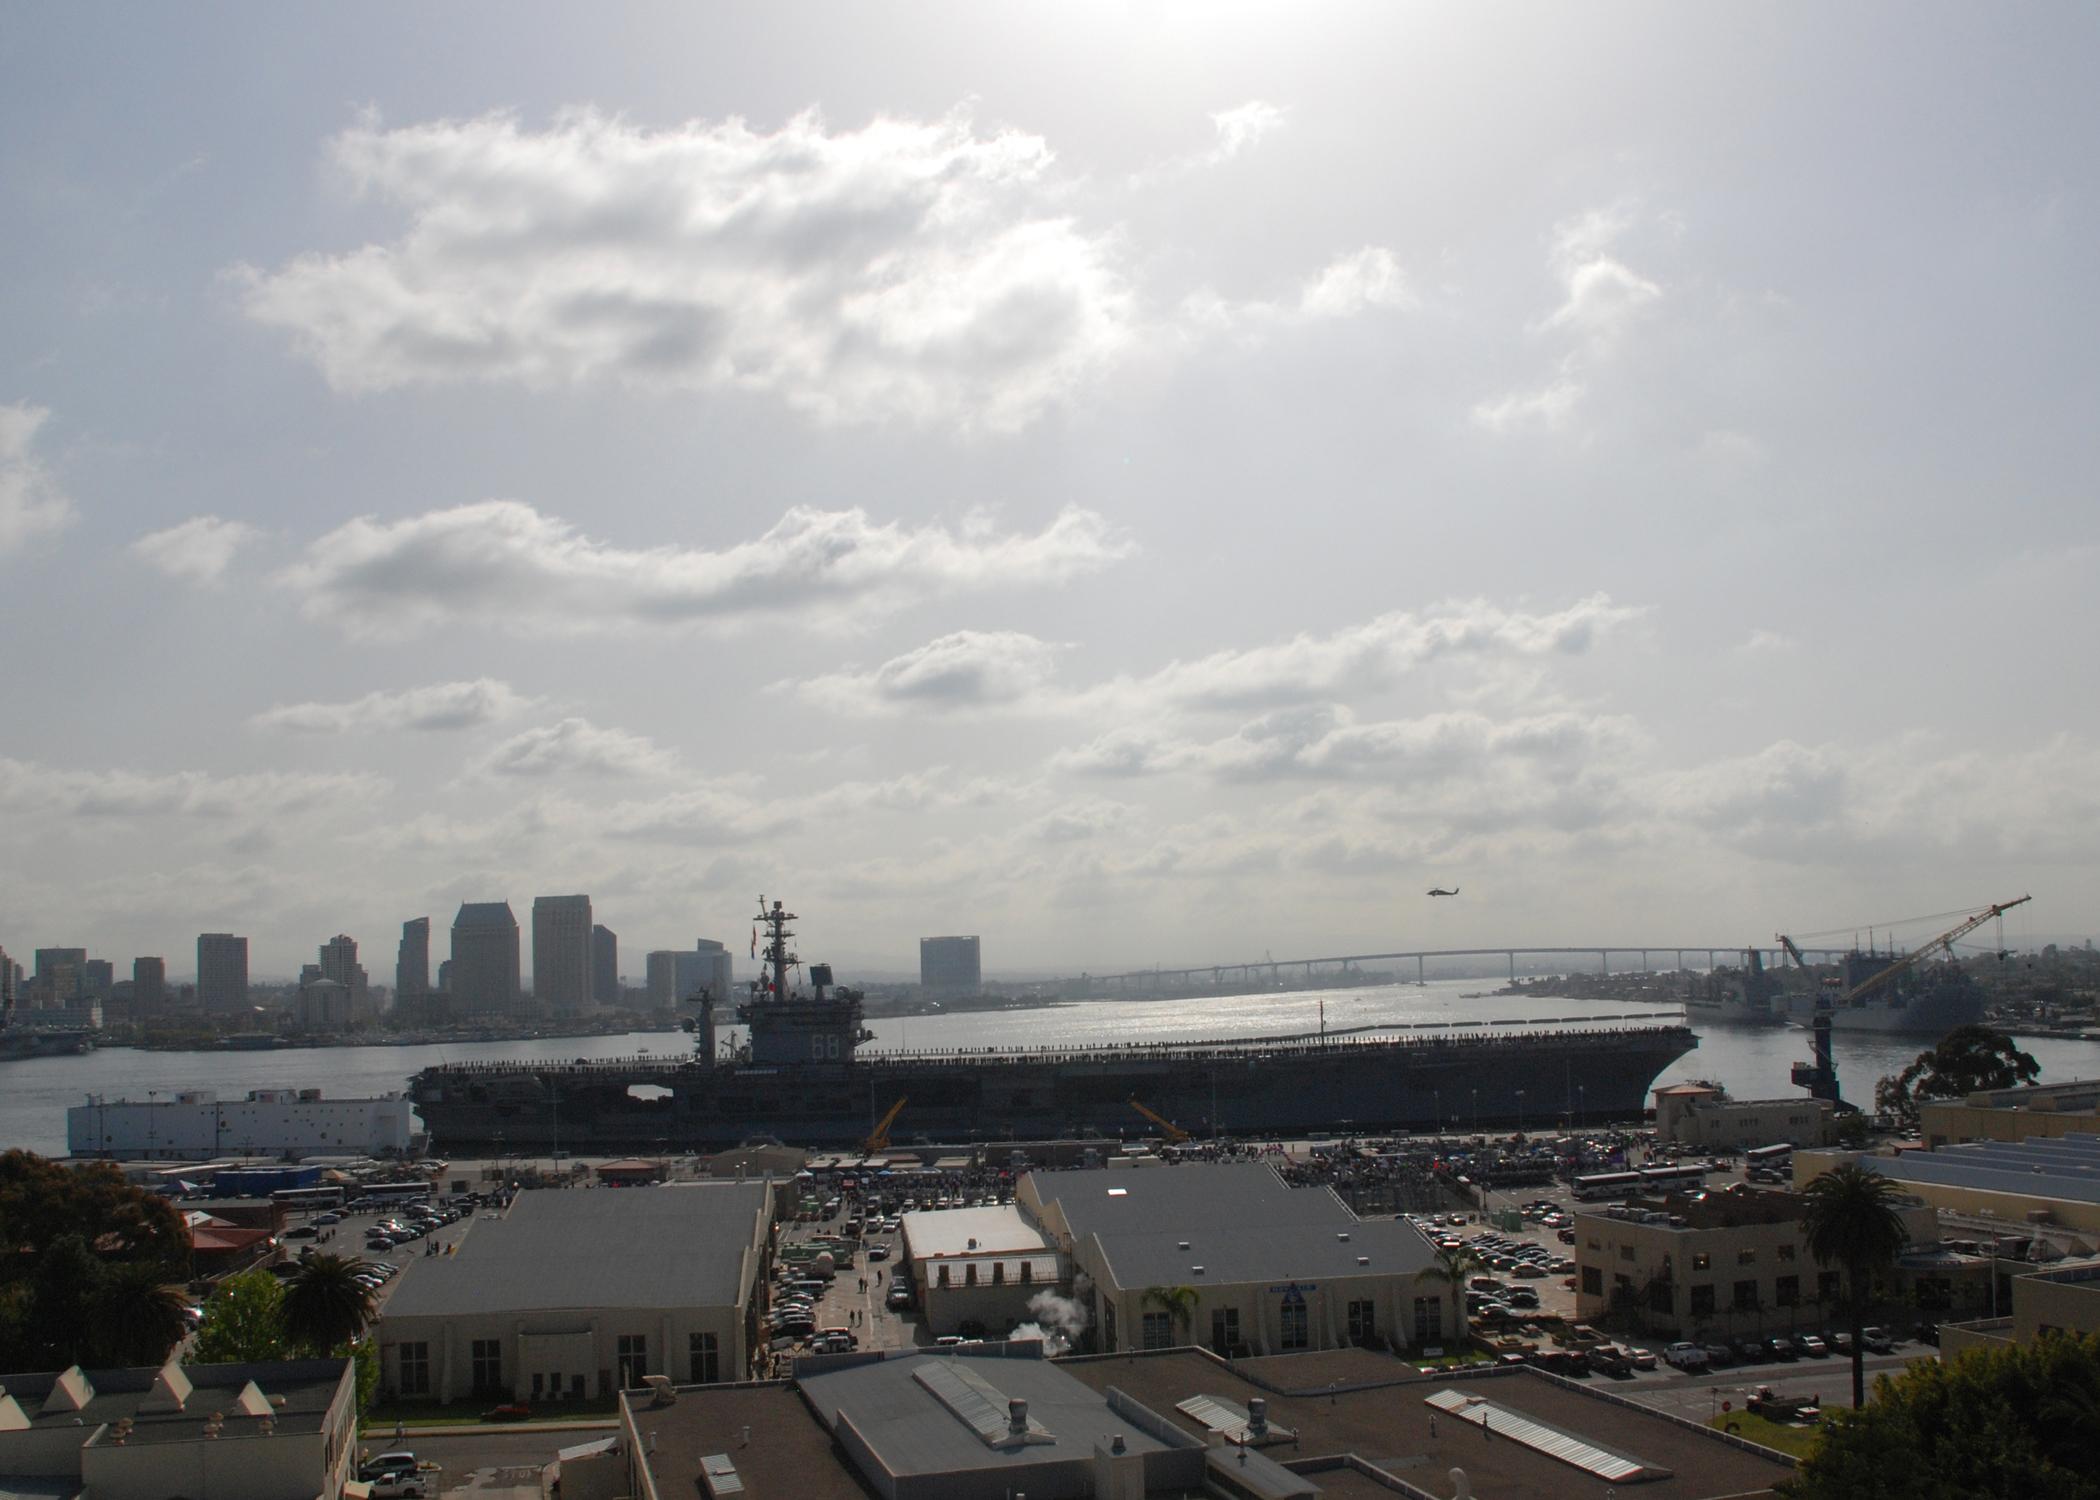 Coronado Common Sense April - Map of us navy 5th fleet area of responsibility